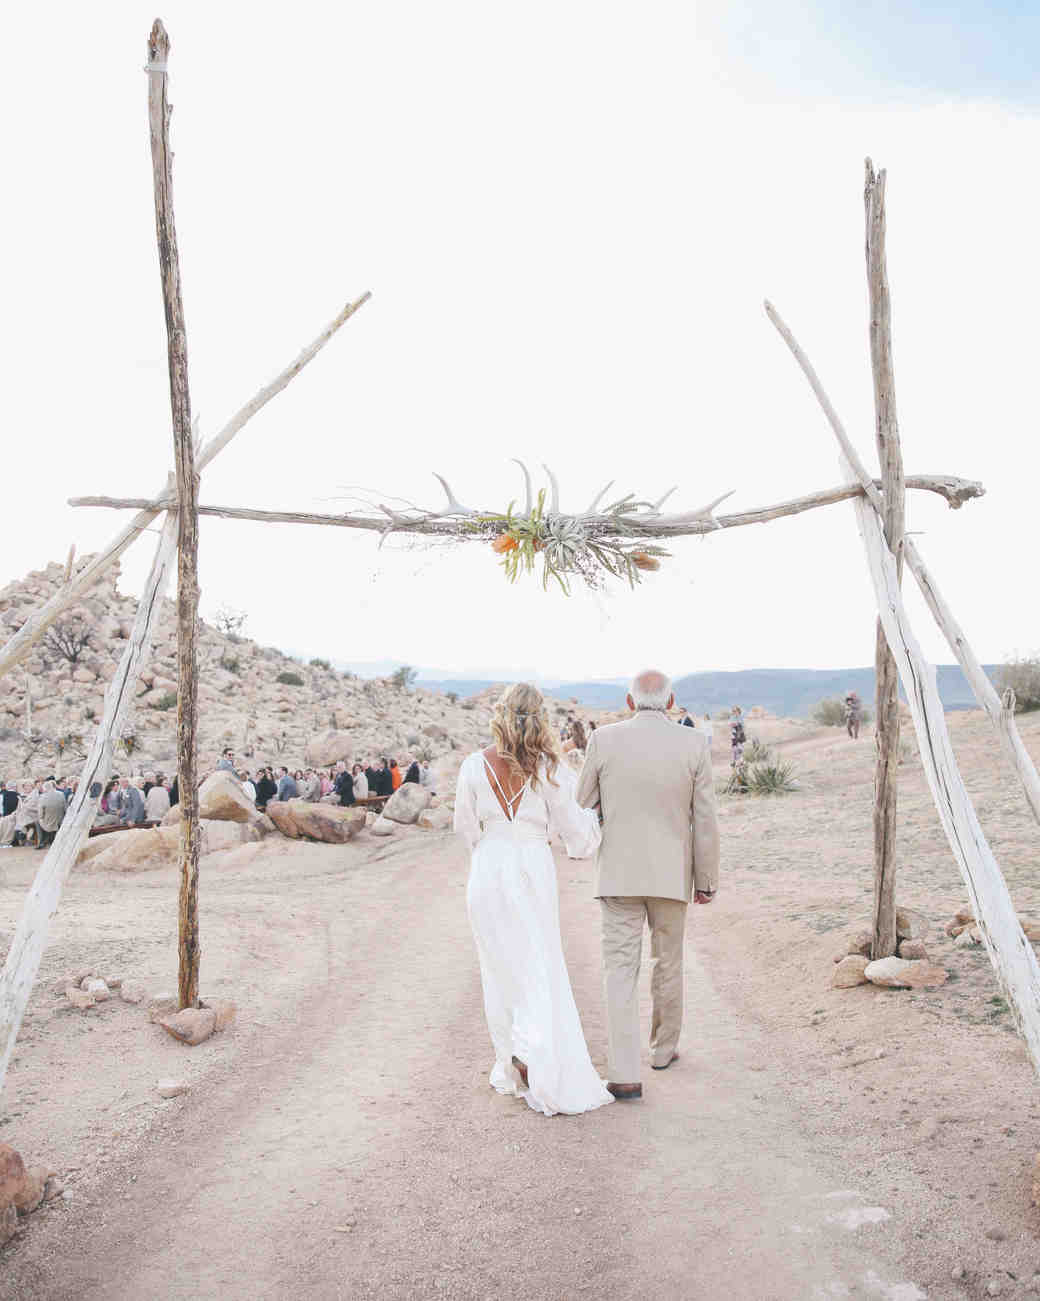 christen-billy-wedding-dad-082-011-s111597-1014.jpg